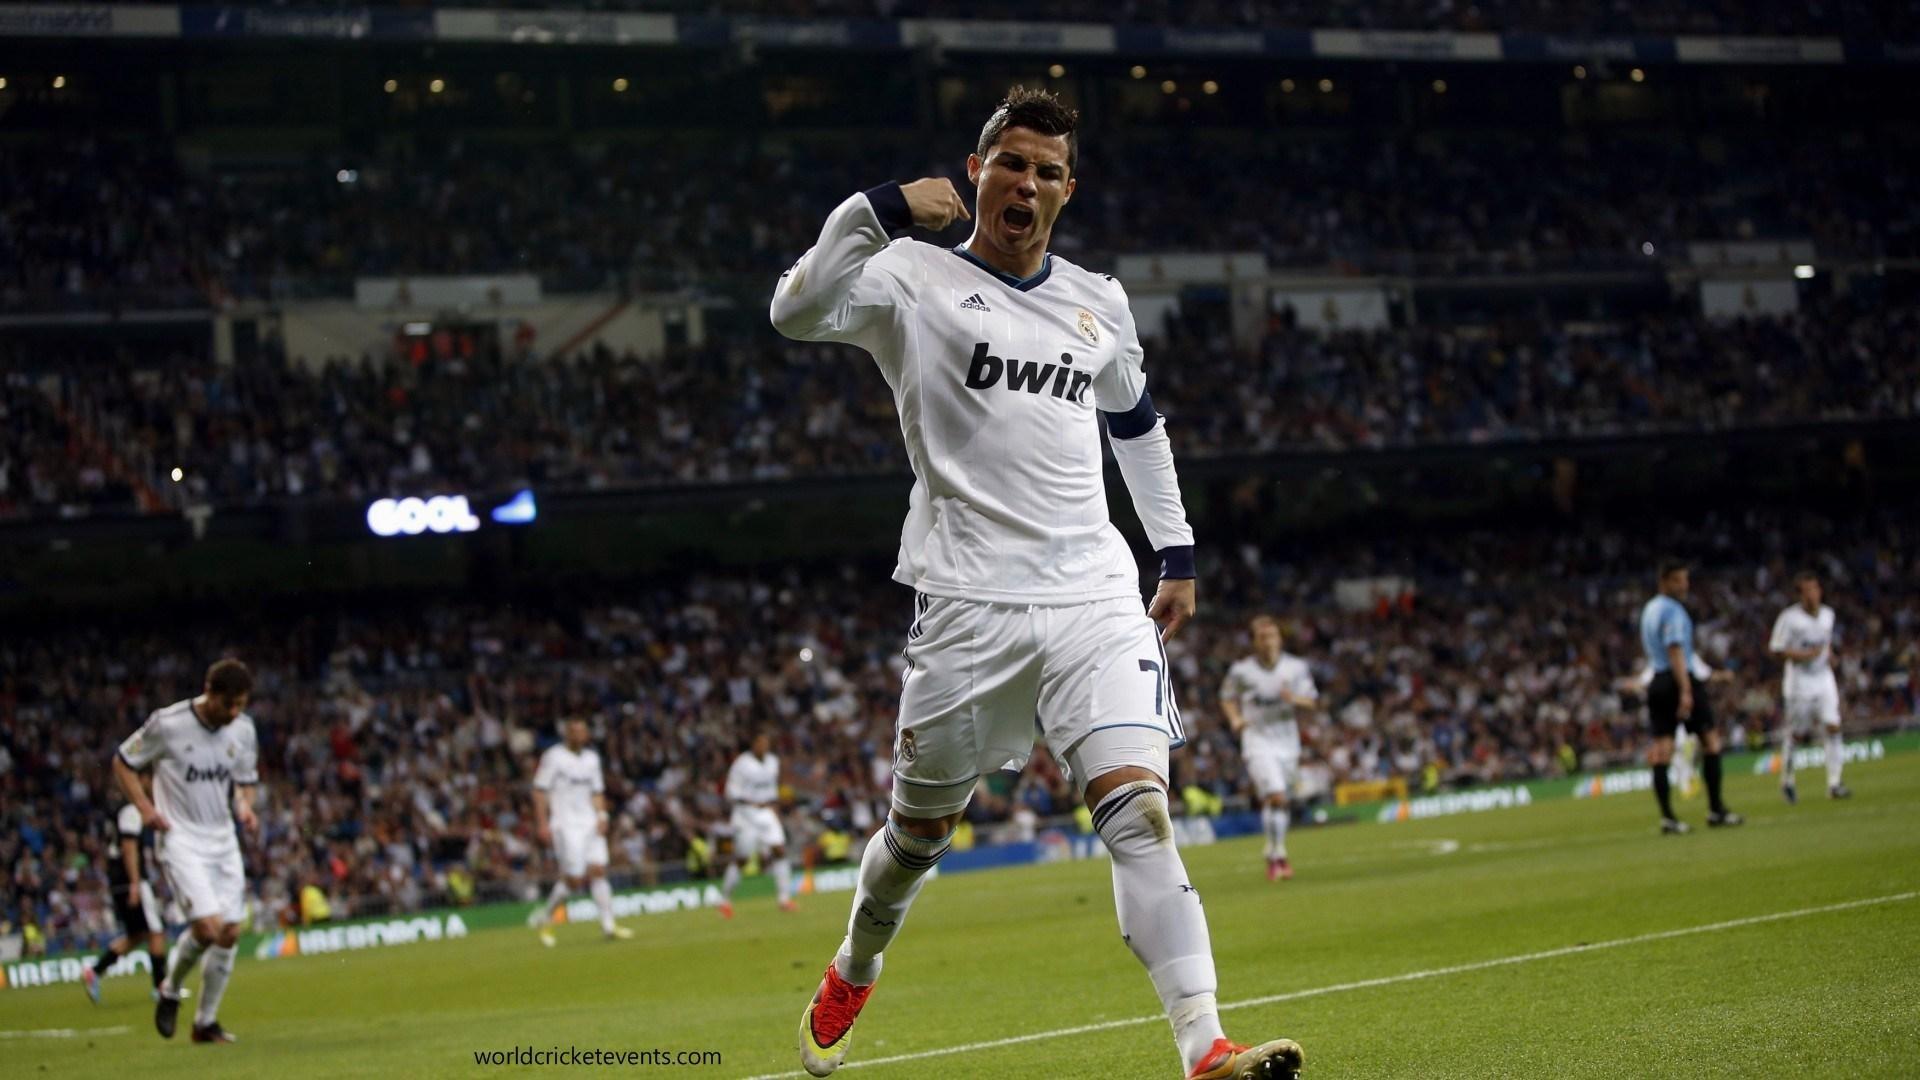 Cristiano-Ronaldo-Best-hd-desktop-http-worldcricketevents.com-